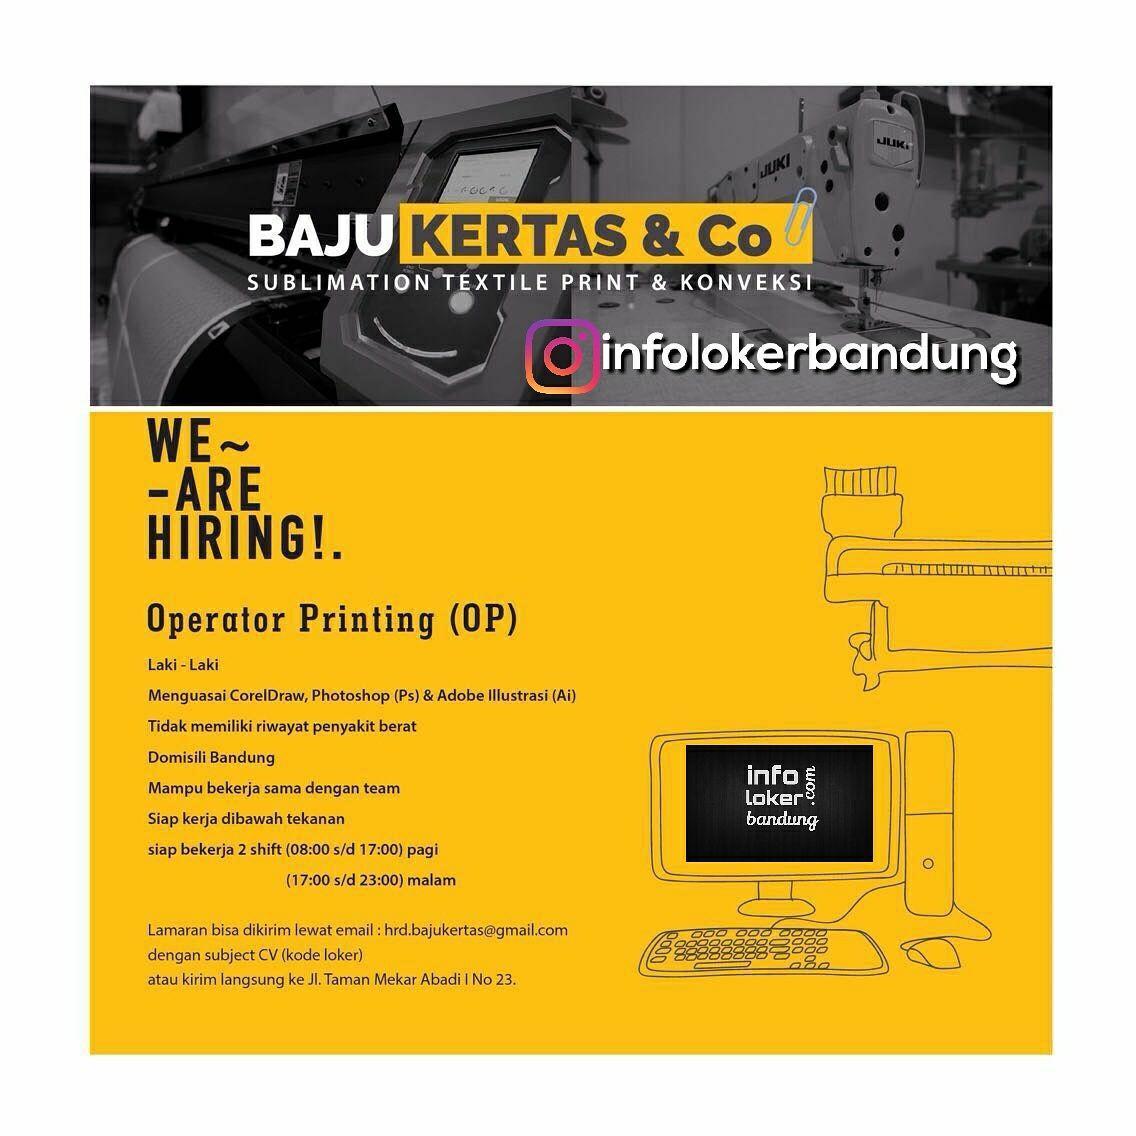 Lowongan Kerja Baju Kertas & Co Bandung September  2017